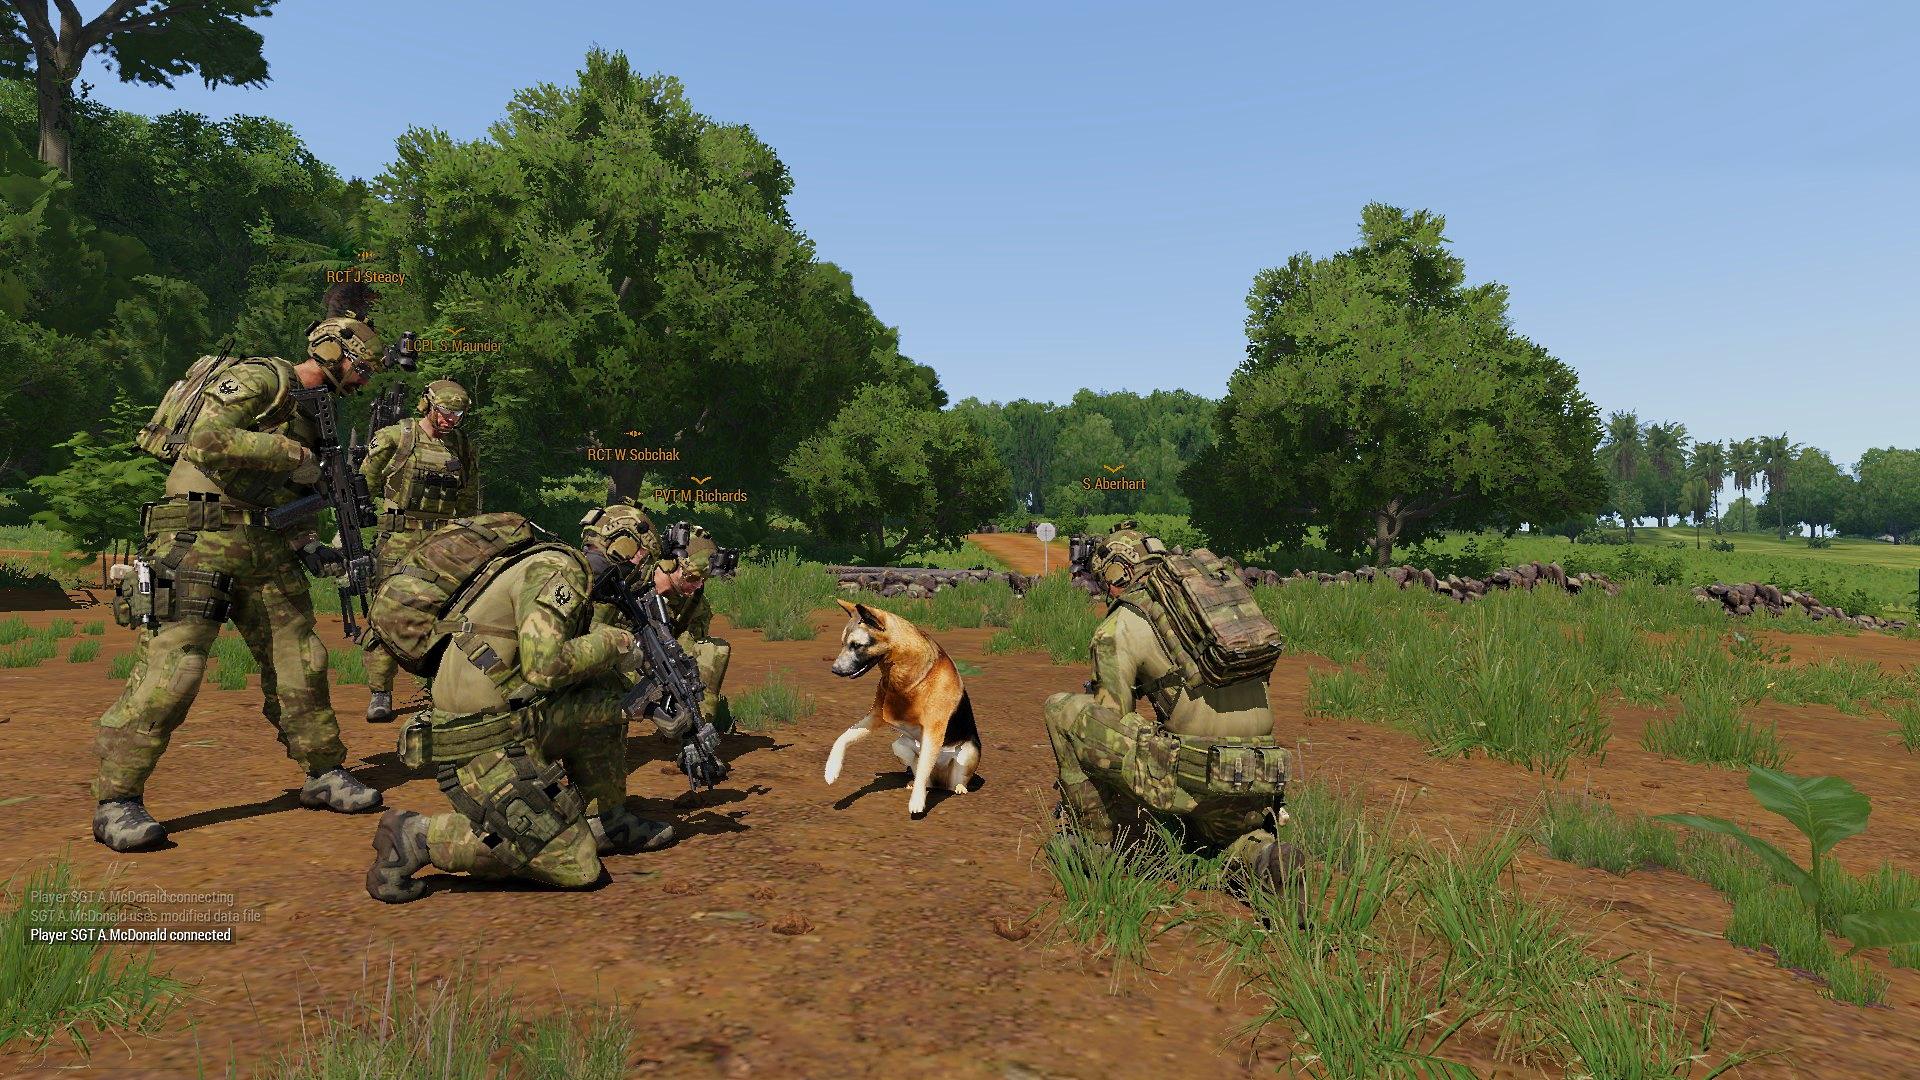 Cooperative ARMA mil-sim